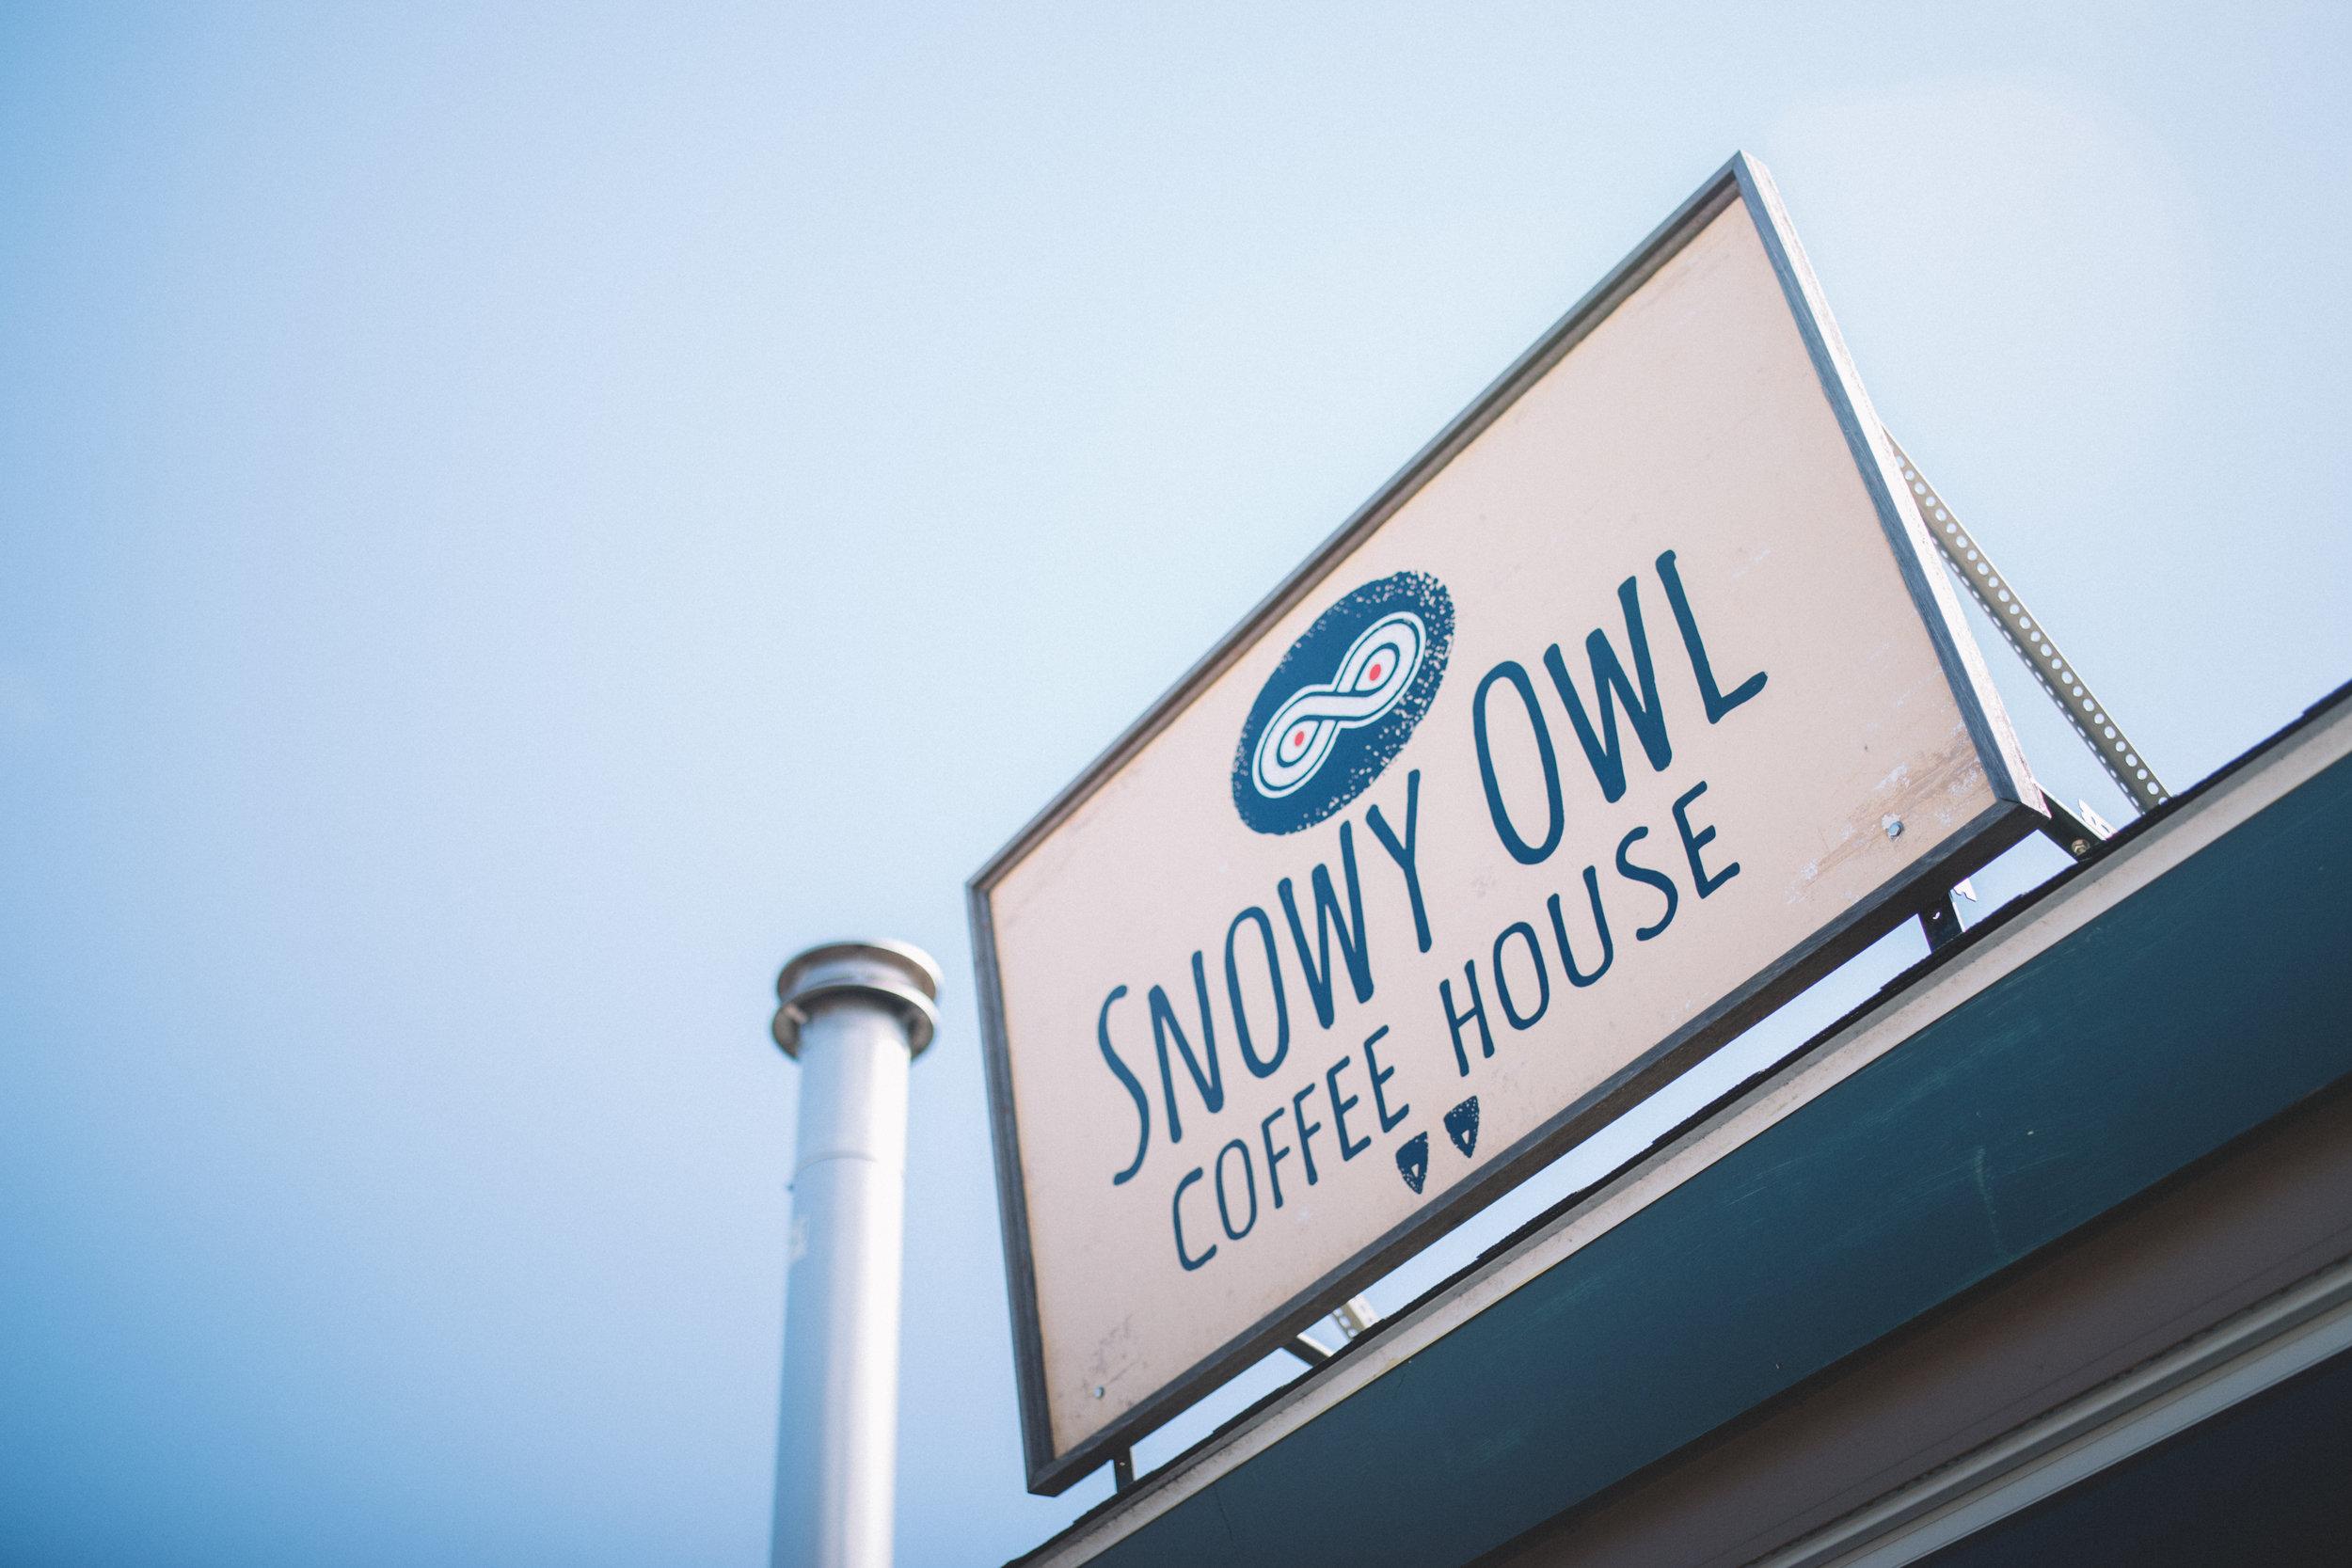 TPC-SnowyOwl-26.jpg